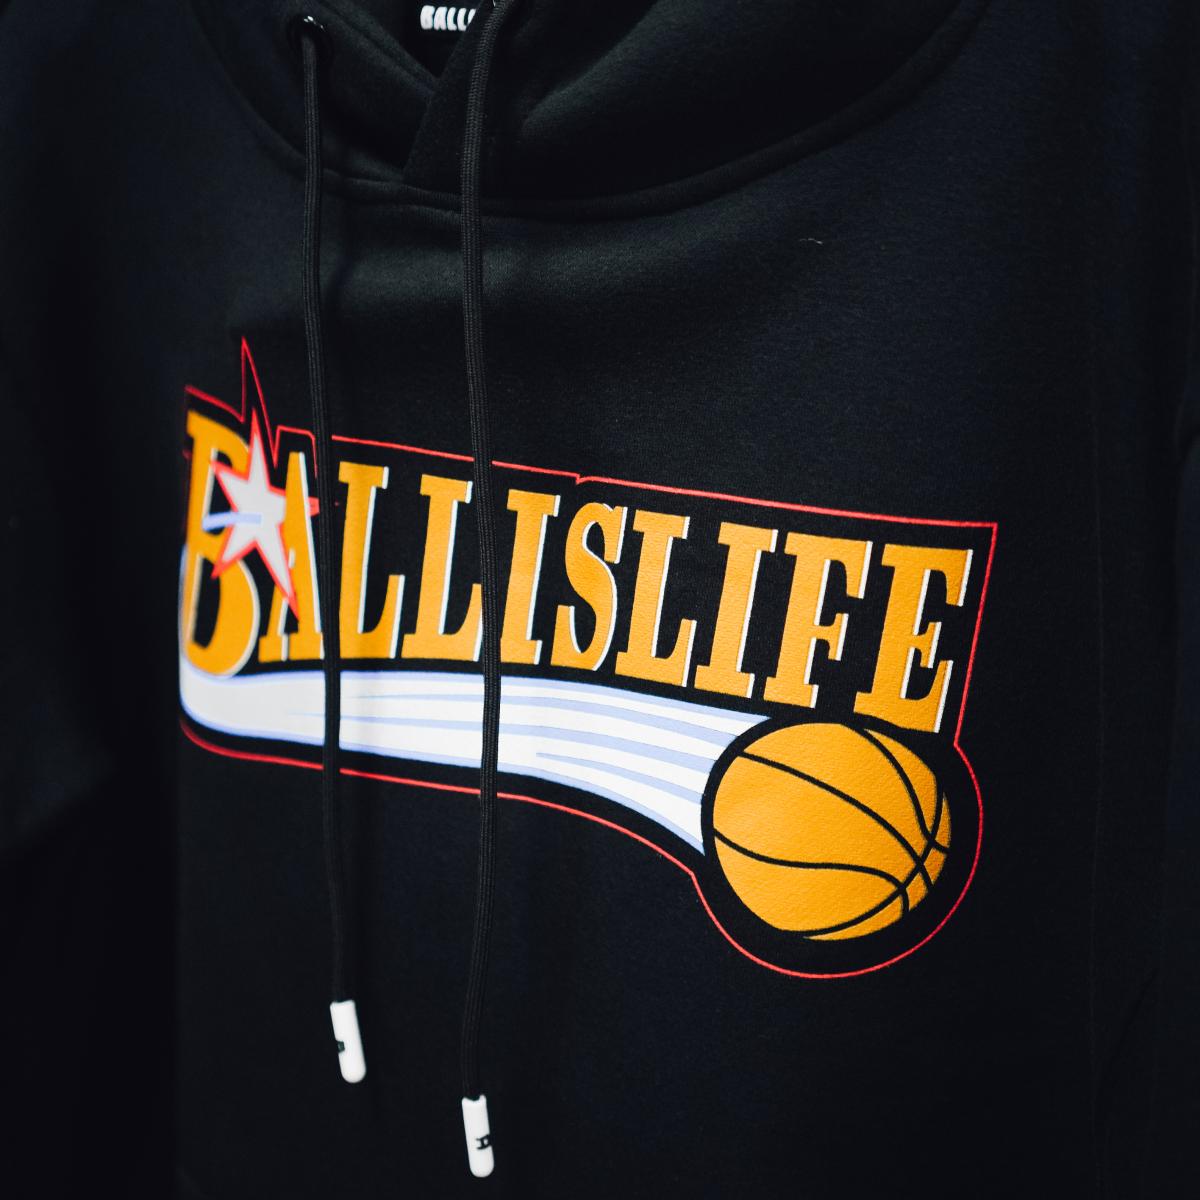 New Ballislife Gear!